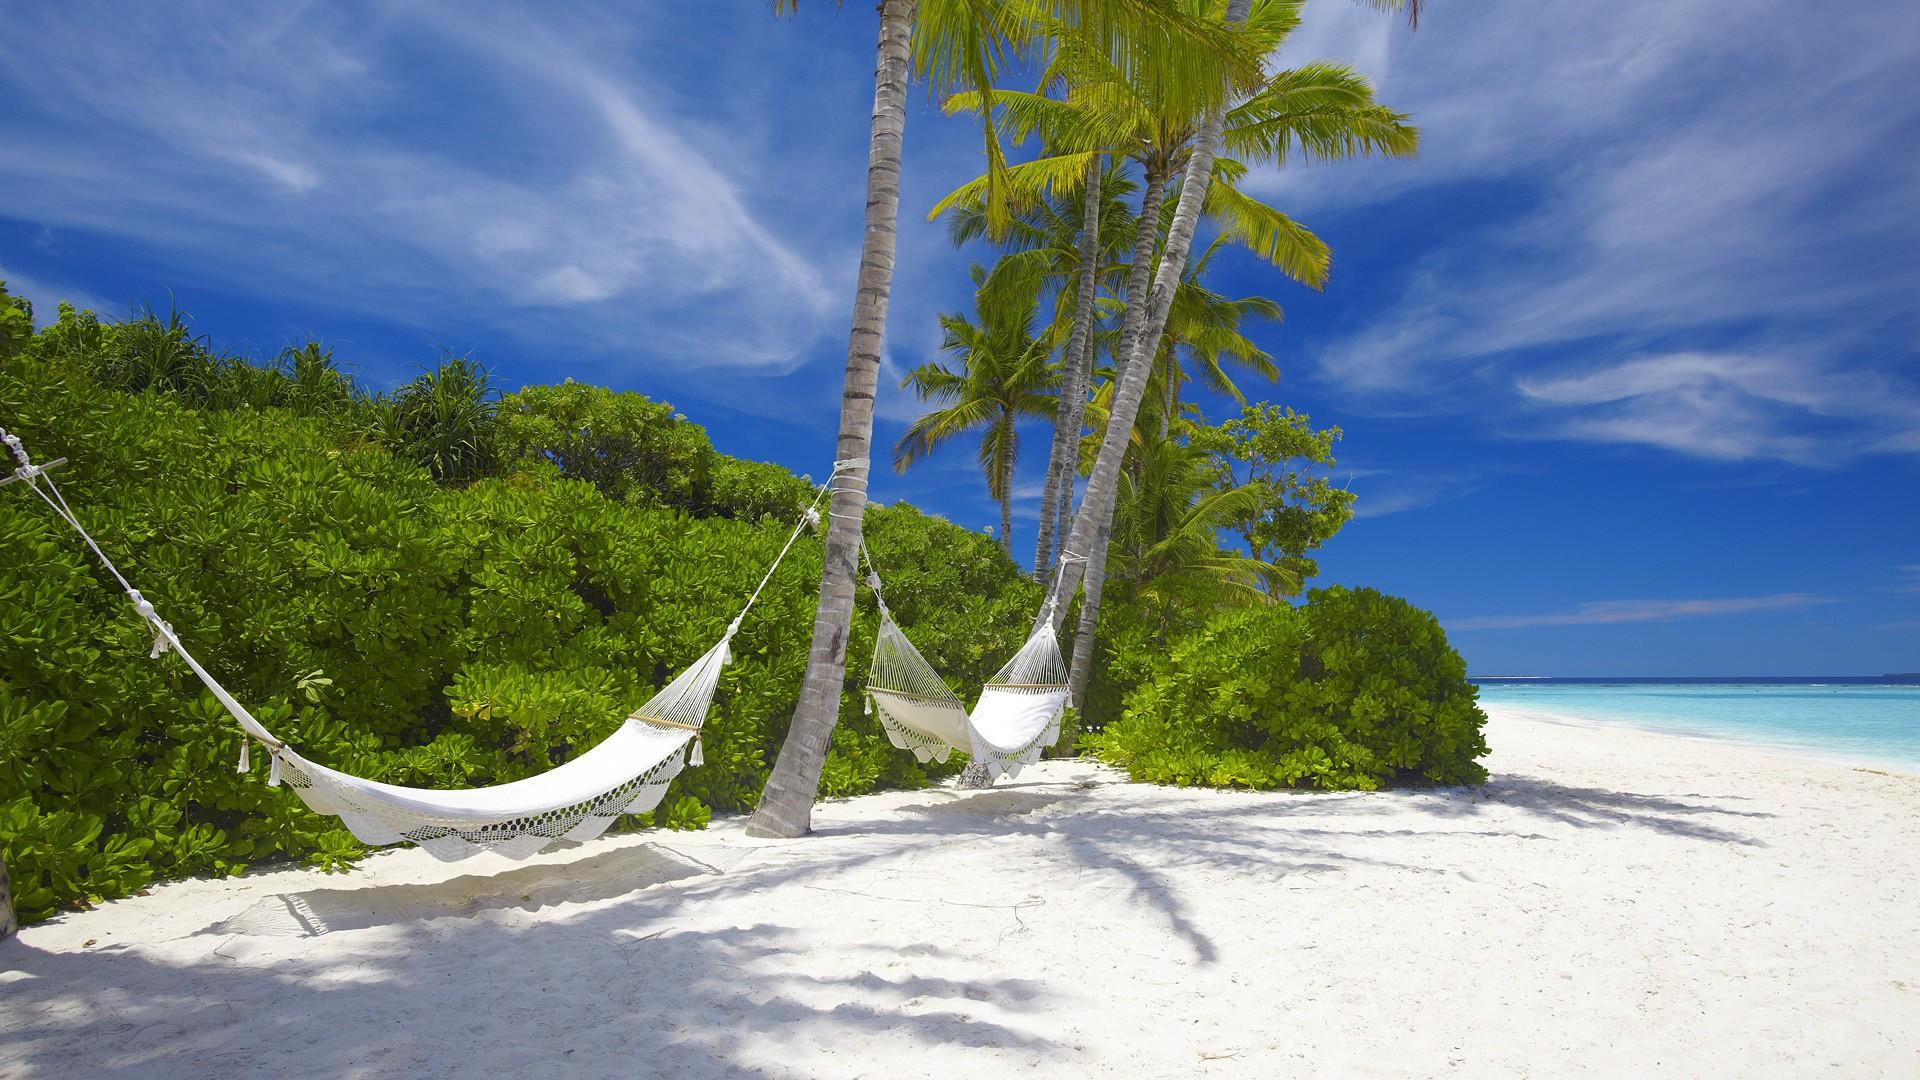 Hammocks on the beach - Hammocks Hung On The Trees